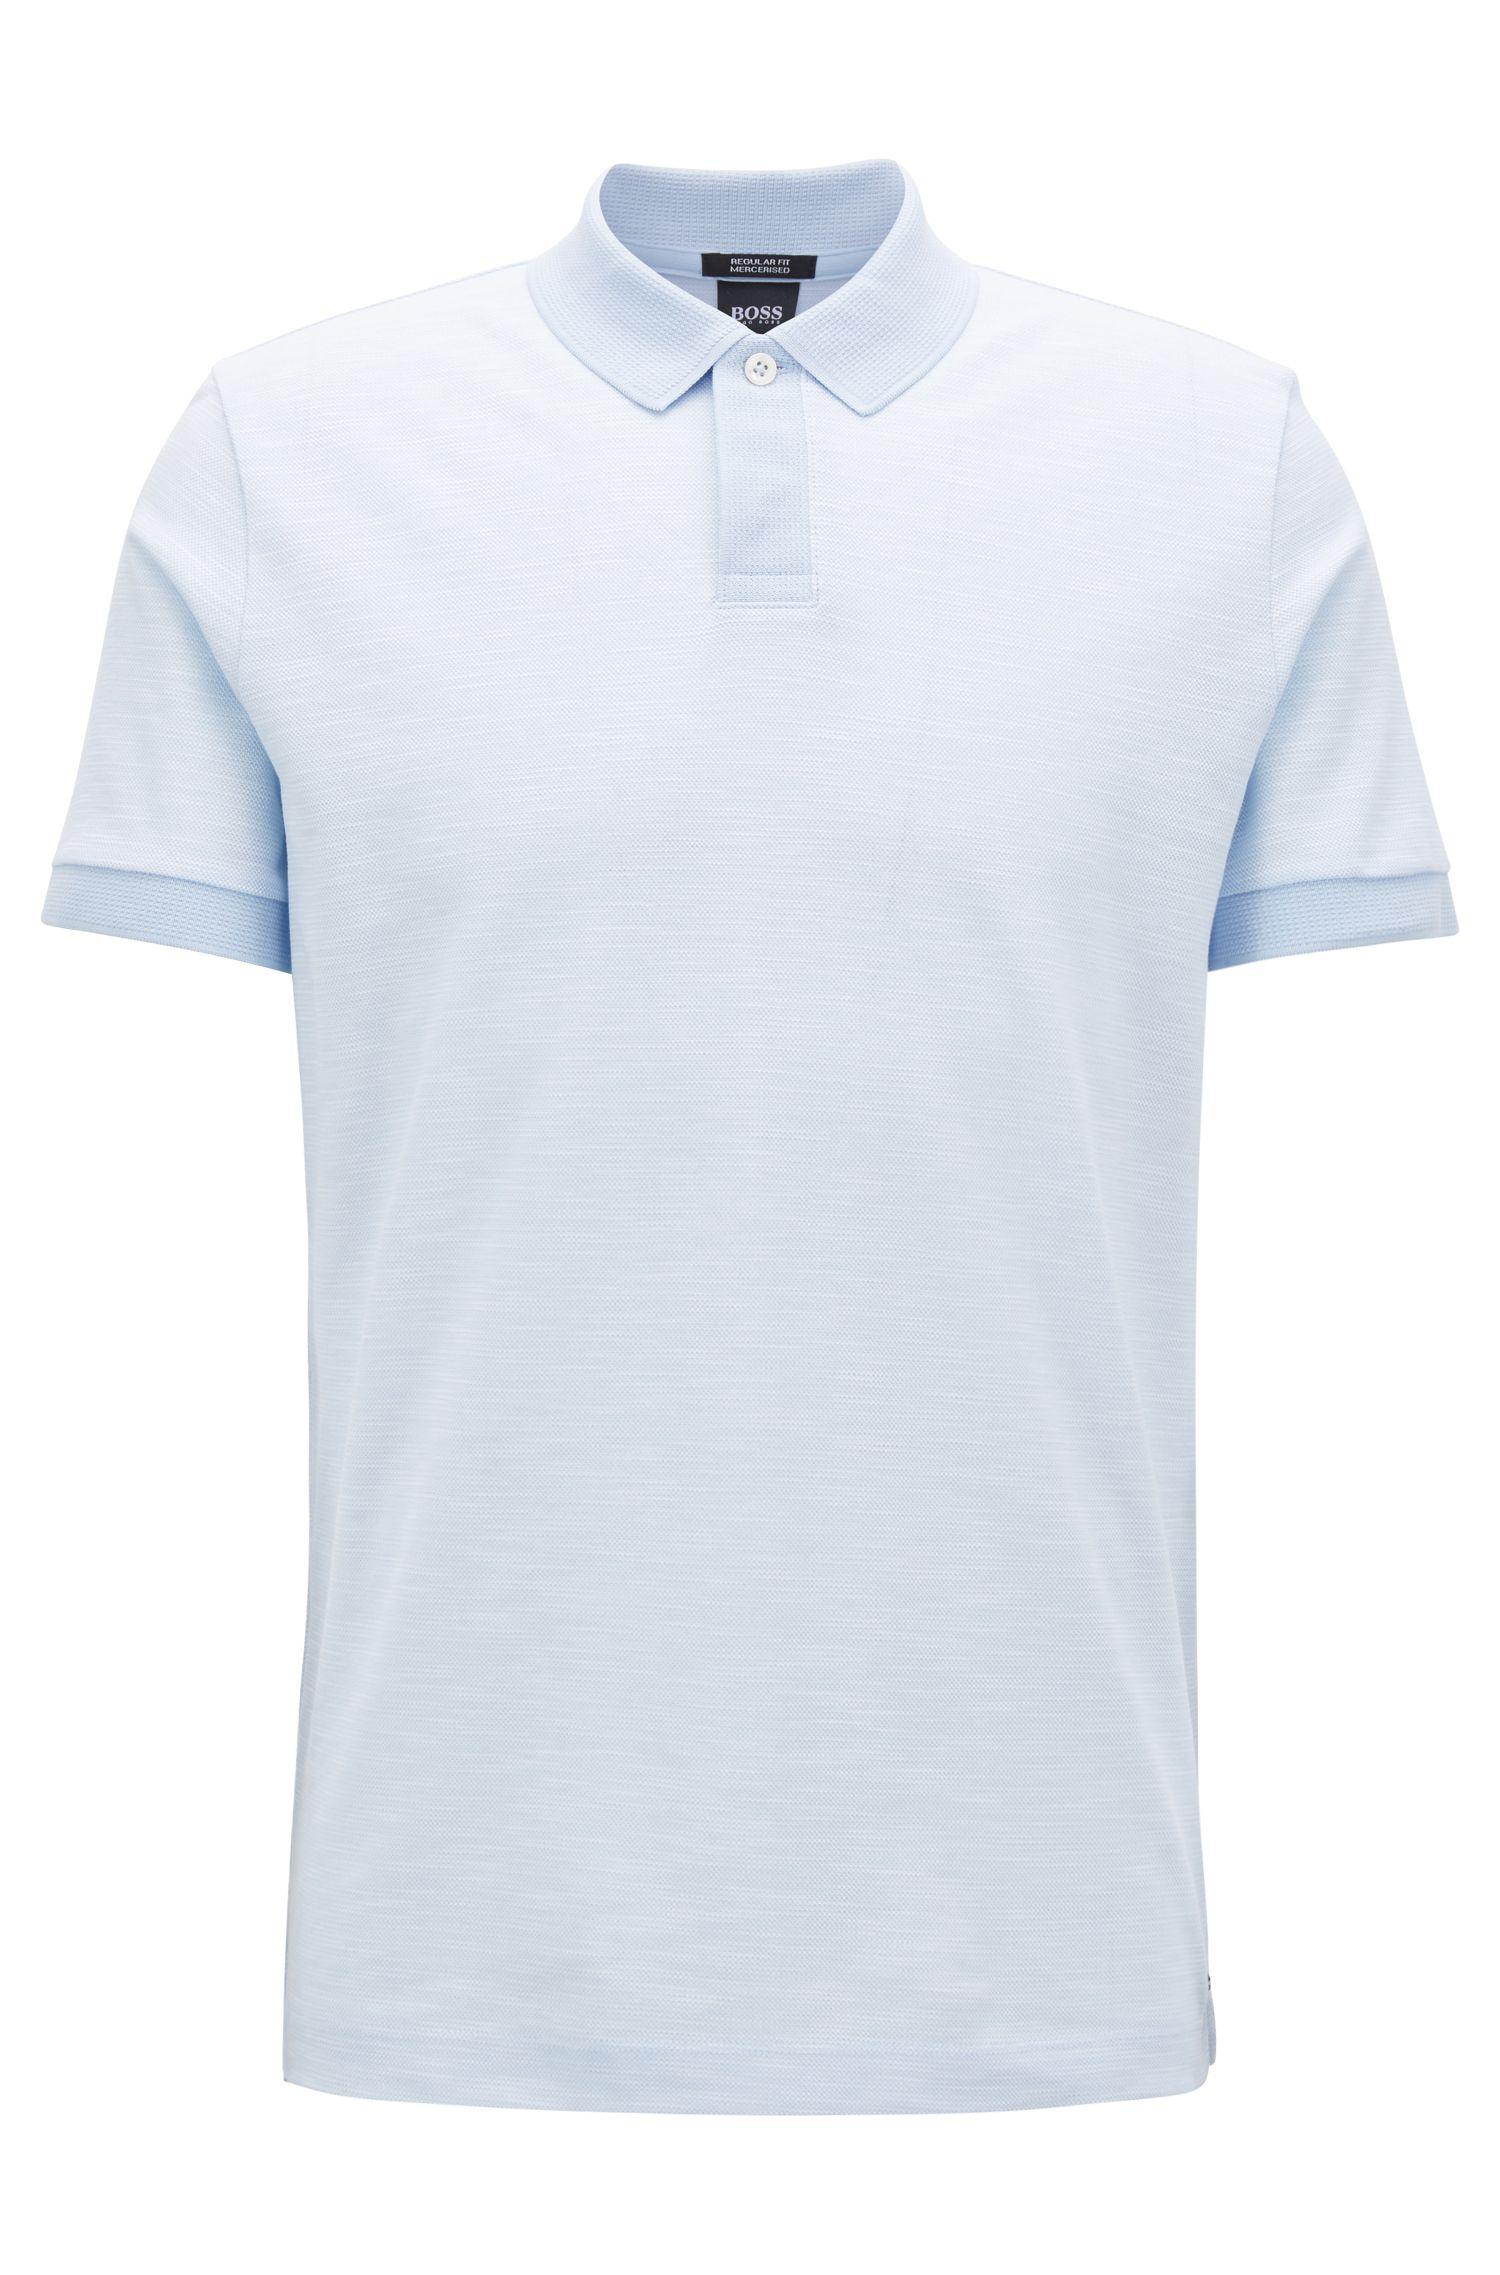 Mercerized Cotton Polo Shirt, Regular Fit   Parlay